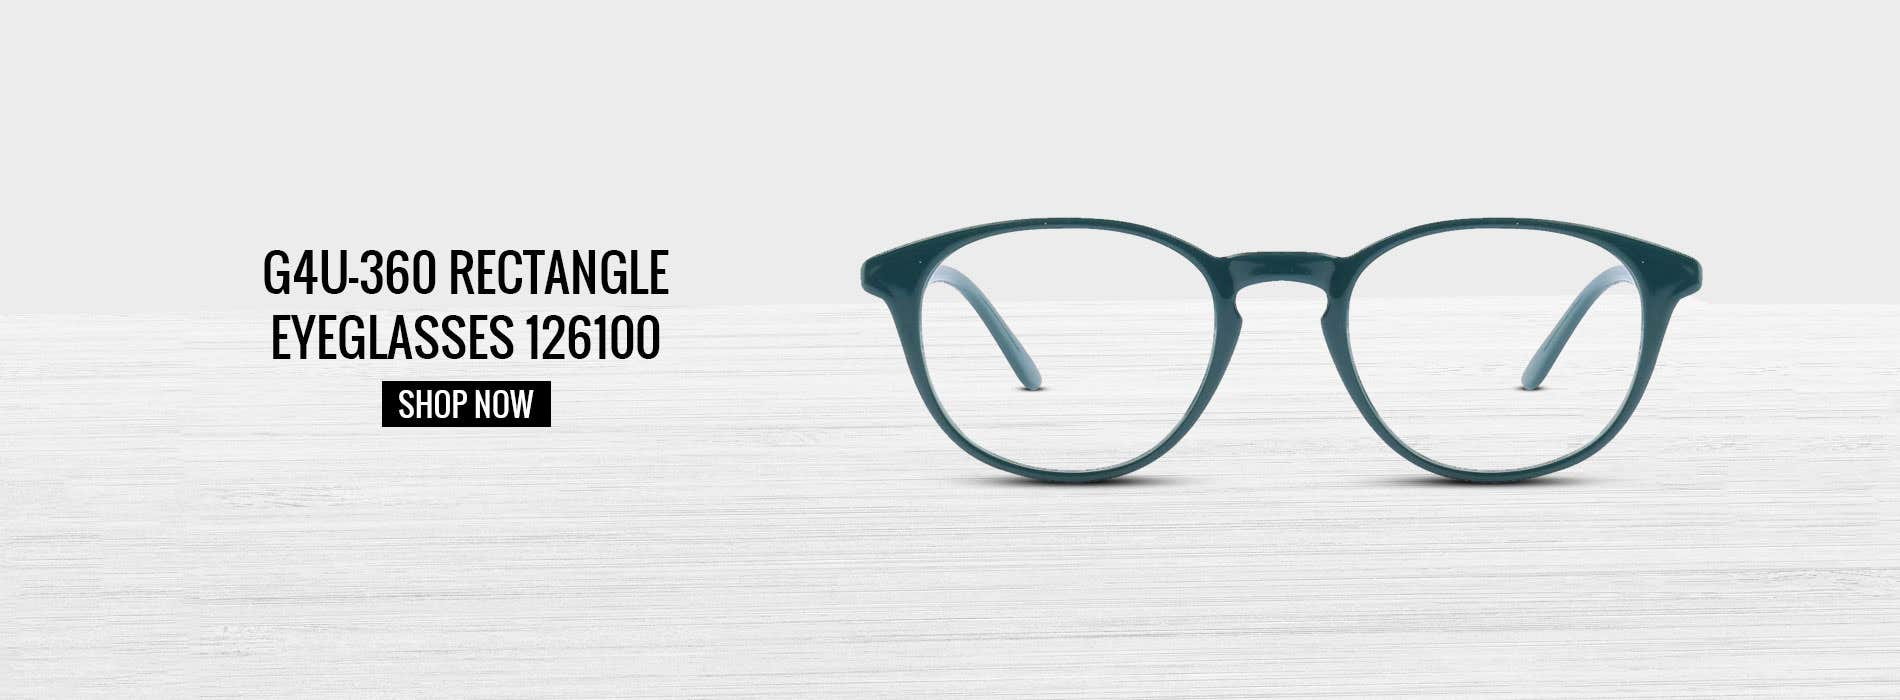 Buy Eyeglasses at Goggles4U